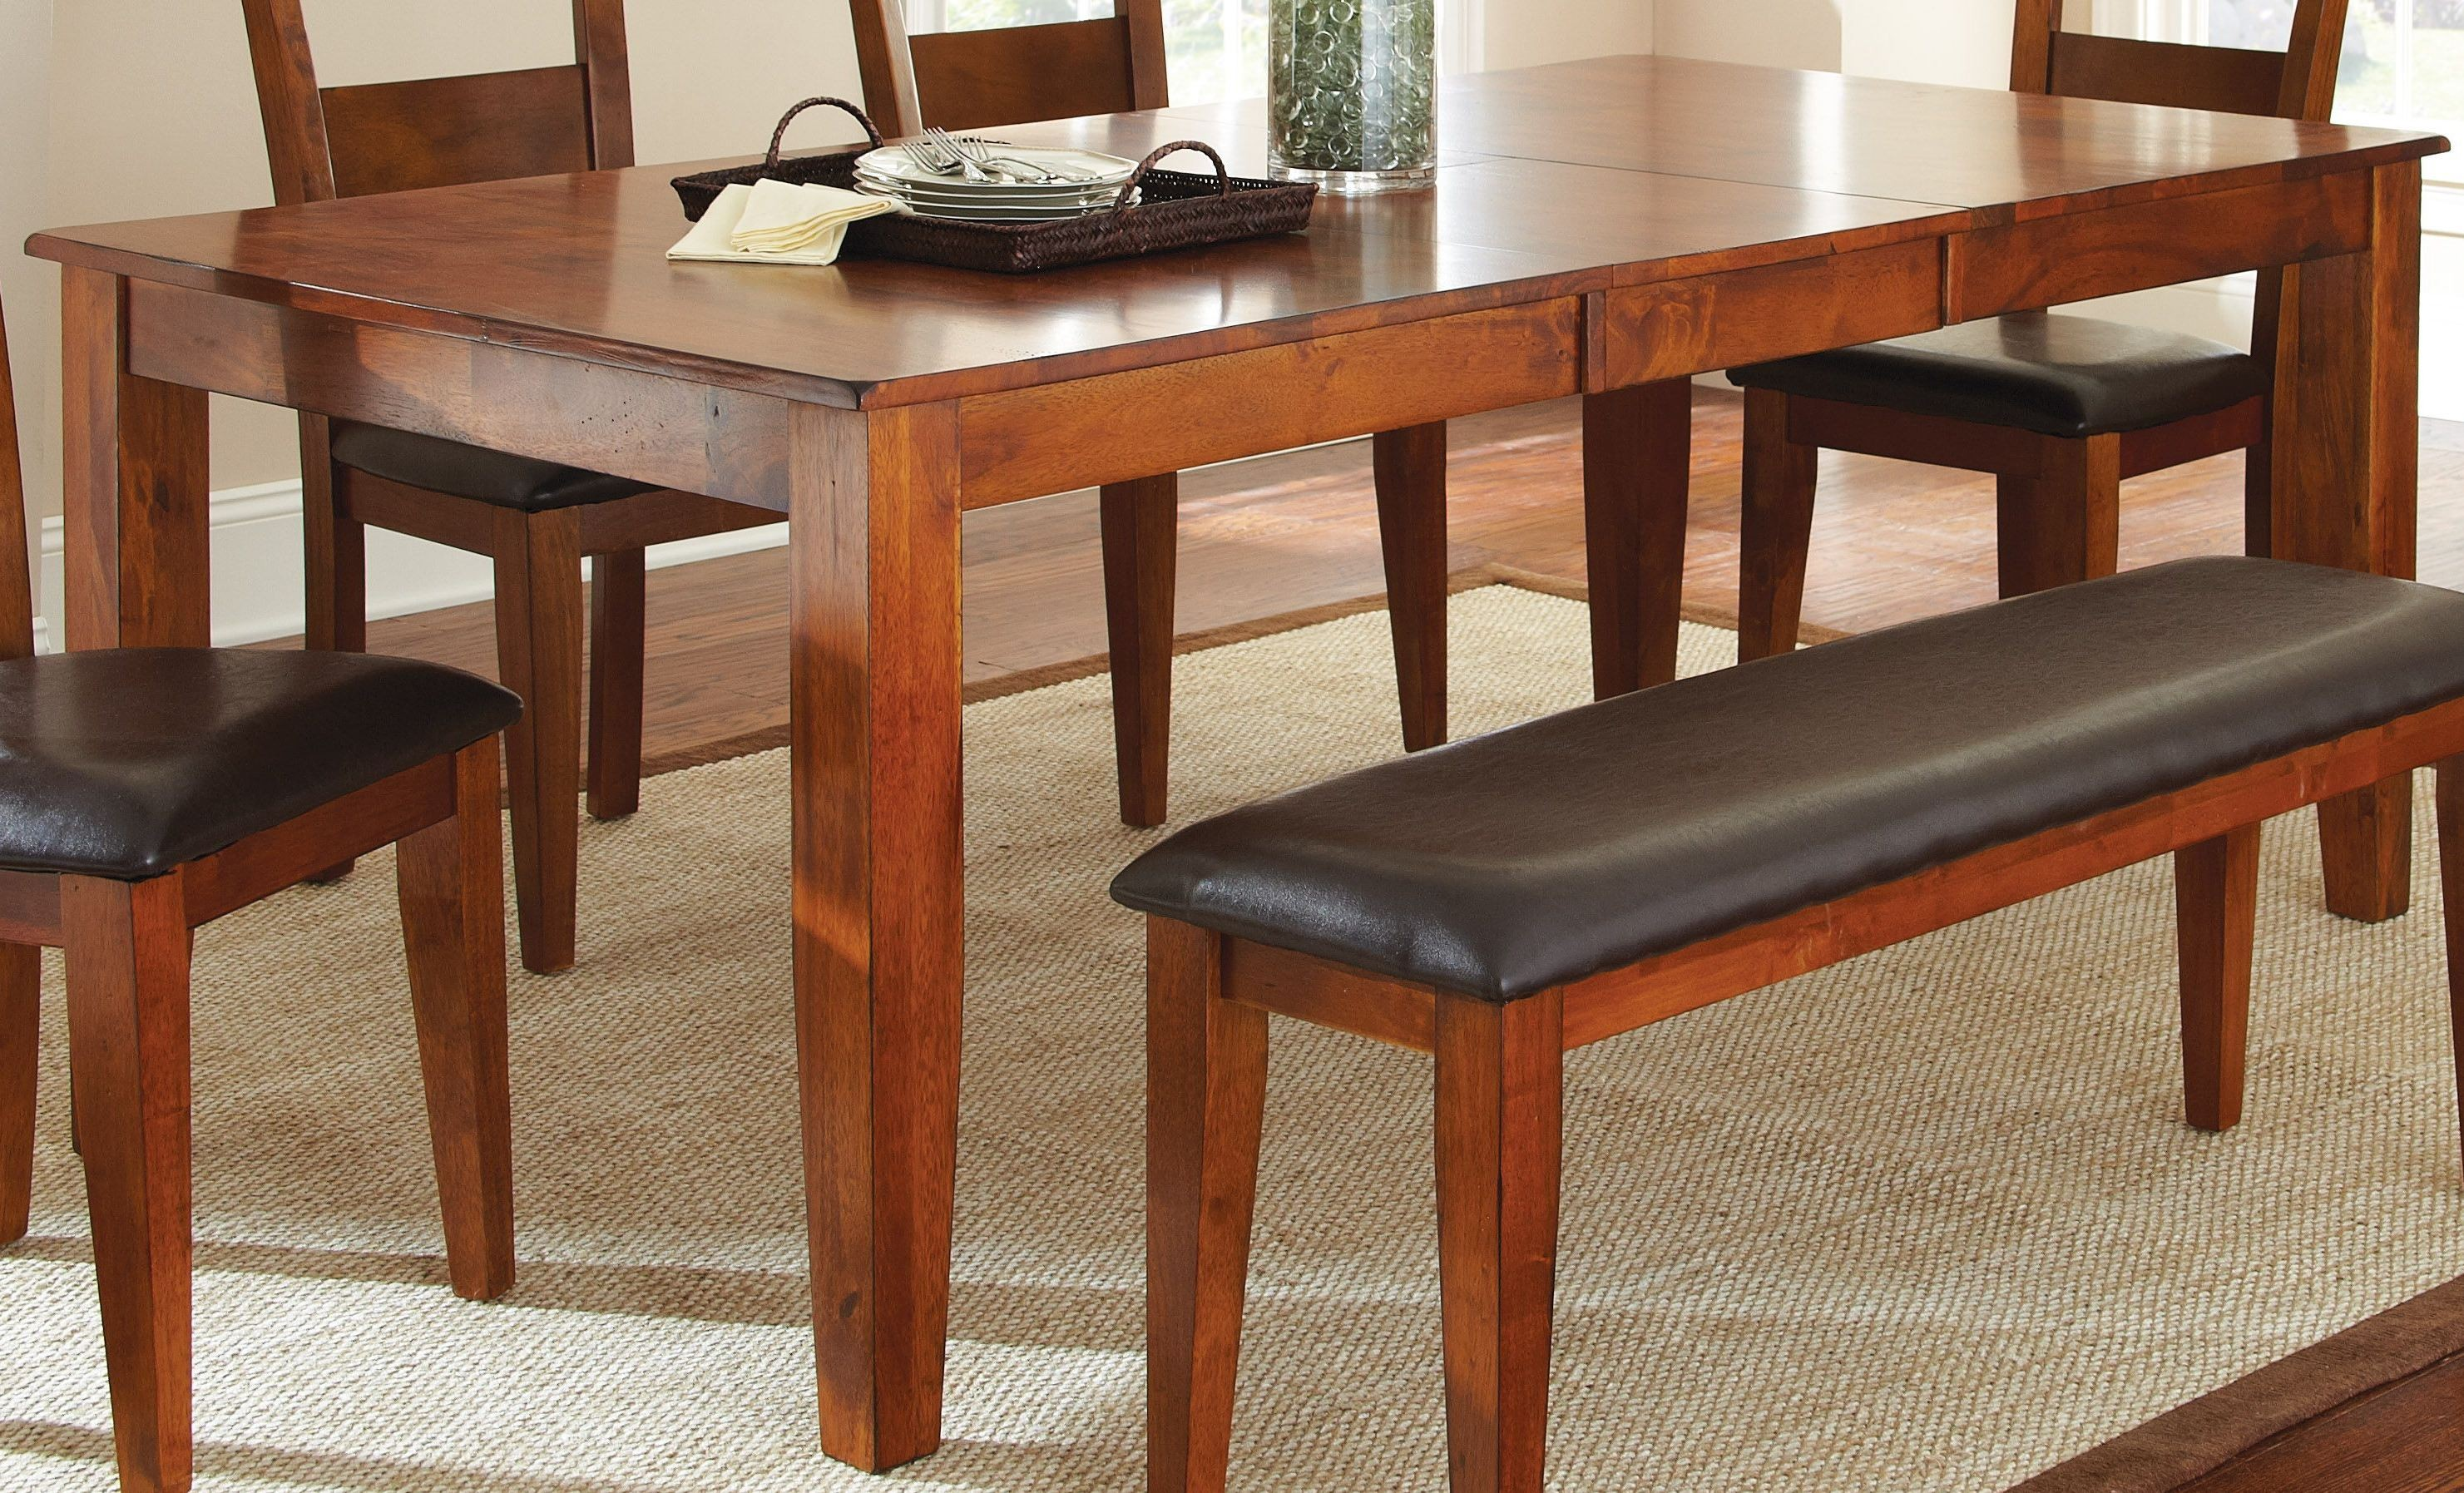 mango medium brown extendable rectangular dining table from steve silver go400tk coleman. Black Bedroom Furniture Sets. Home Design Ideas